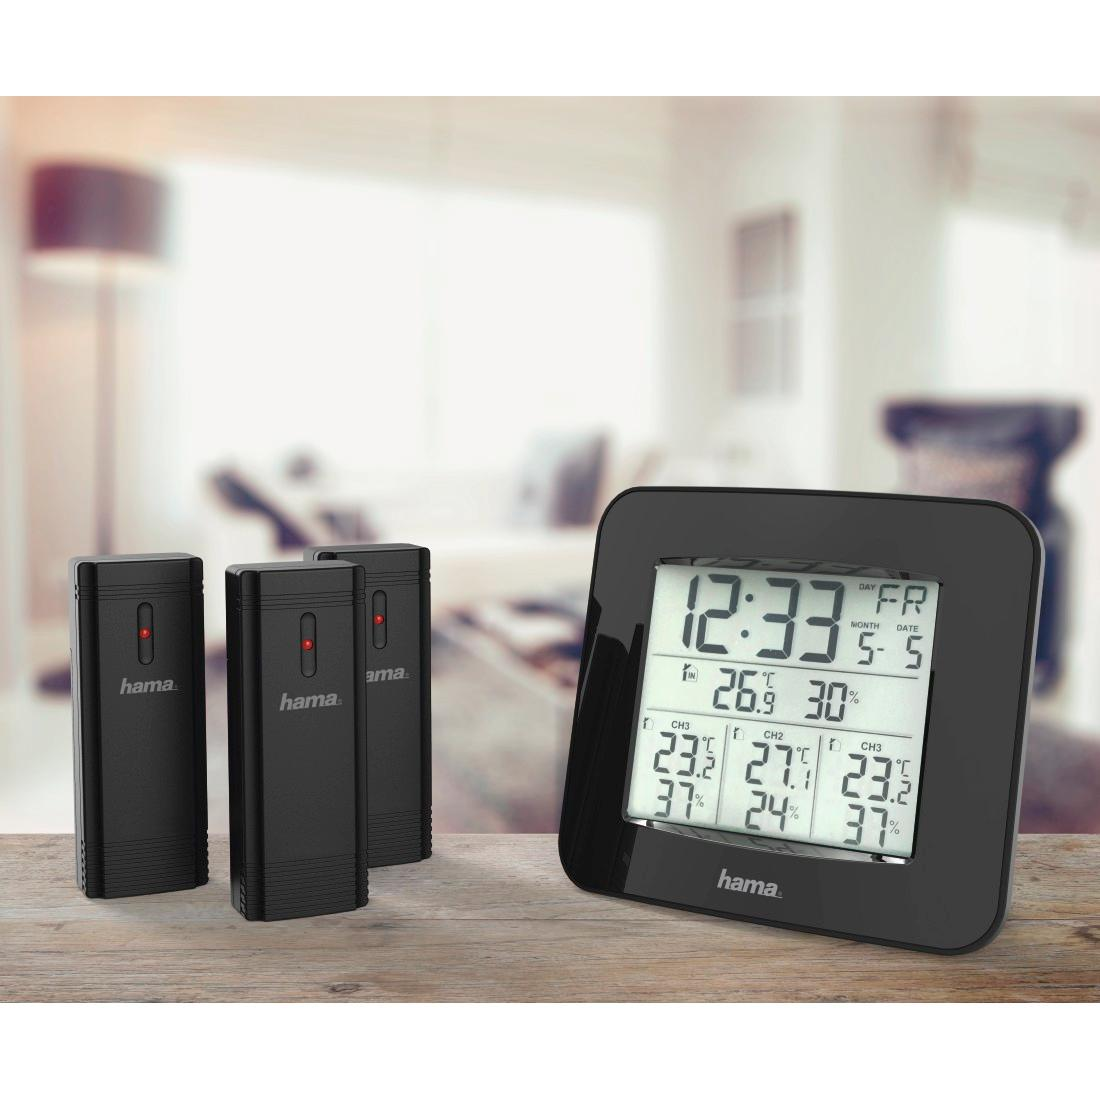 Hama Funk Wetterstation Inkl 3 Au 223 En Sensoren Thermometer Hygrometer Au 223 En Ebay